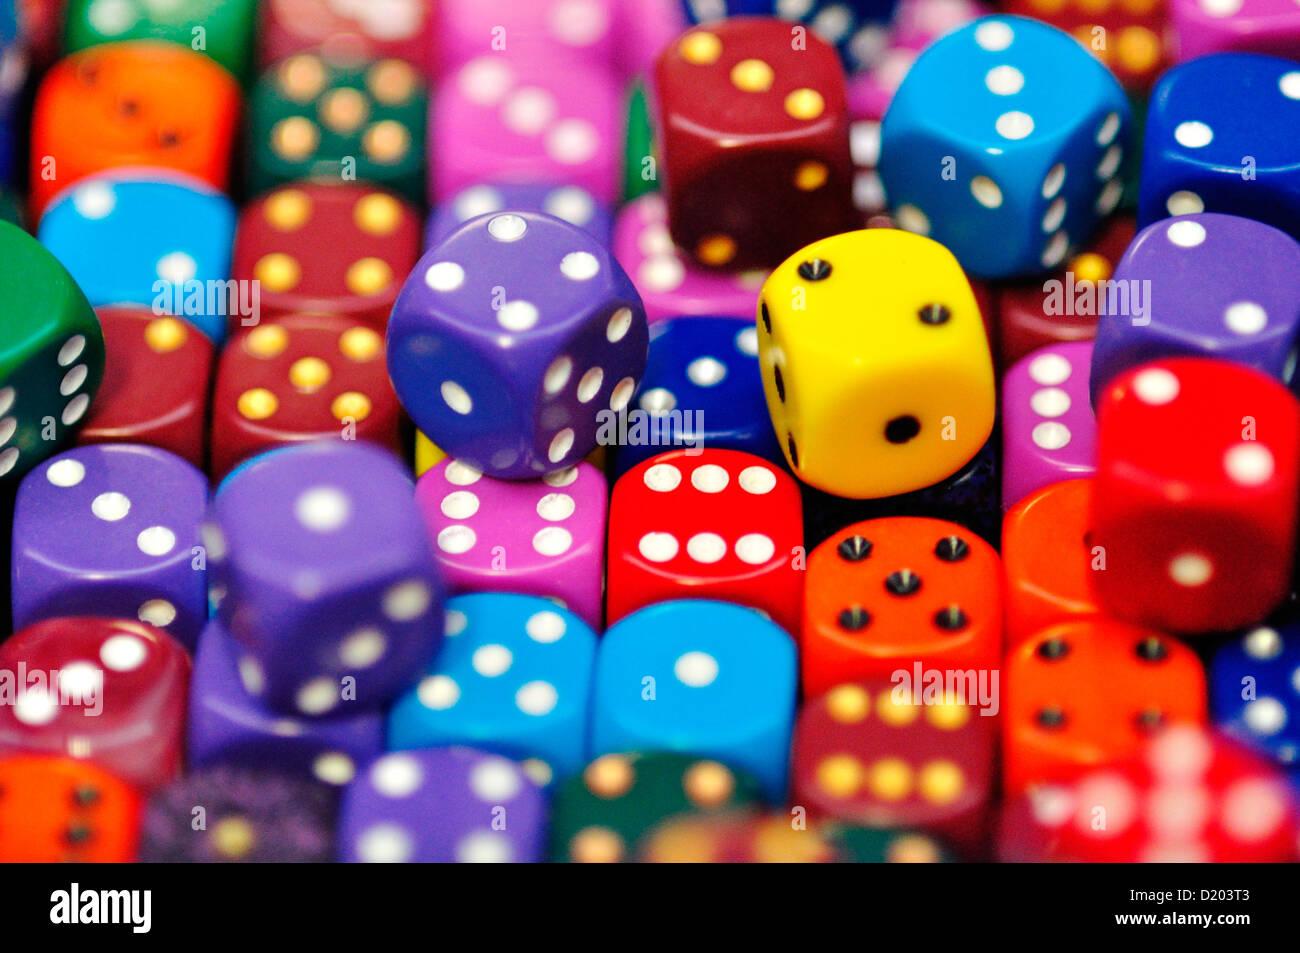 Colorful Dice Stock Photo: 52863443 - Alamy